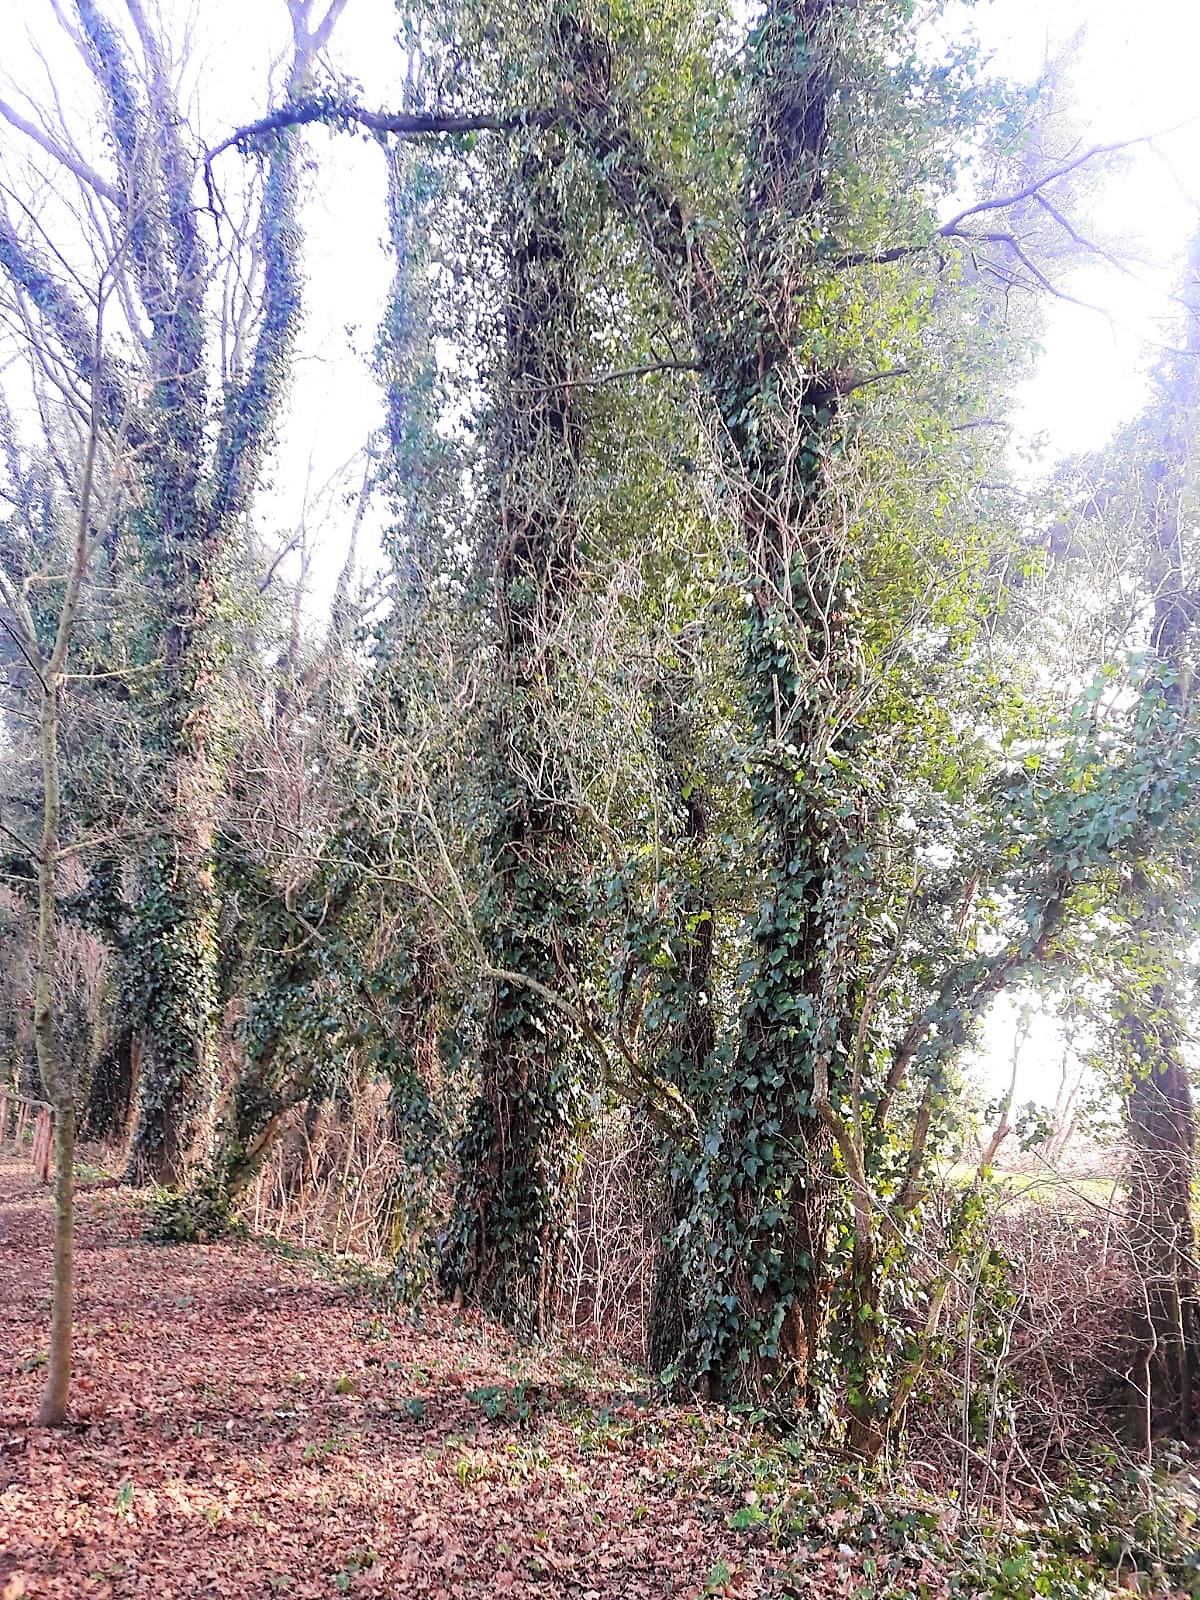 Bosco Wood Wald